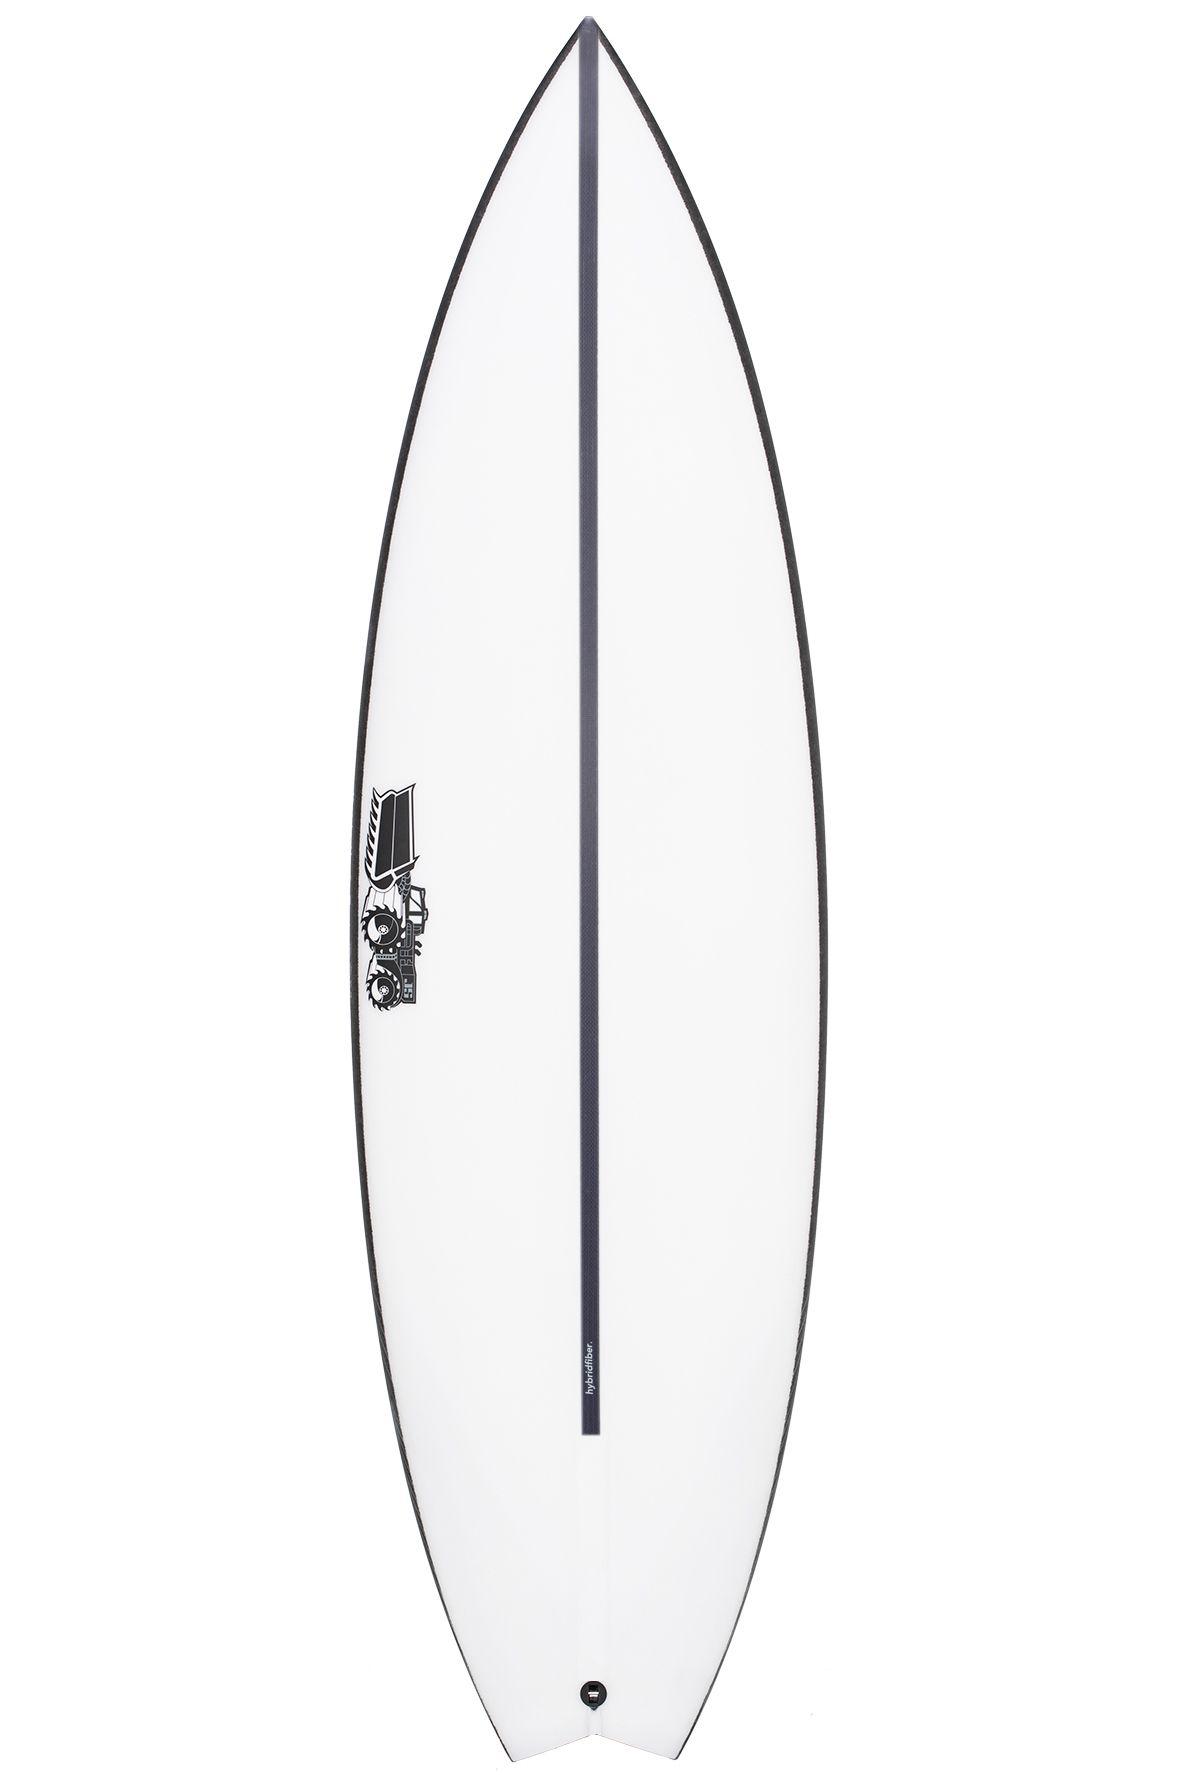 Prancha Surf JS 6'3 MONSTA BOX HYFI Swallow Tail - Color FCS II 6ft3